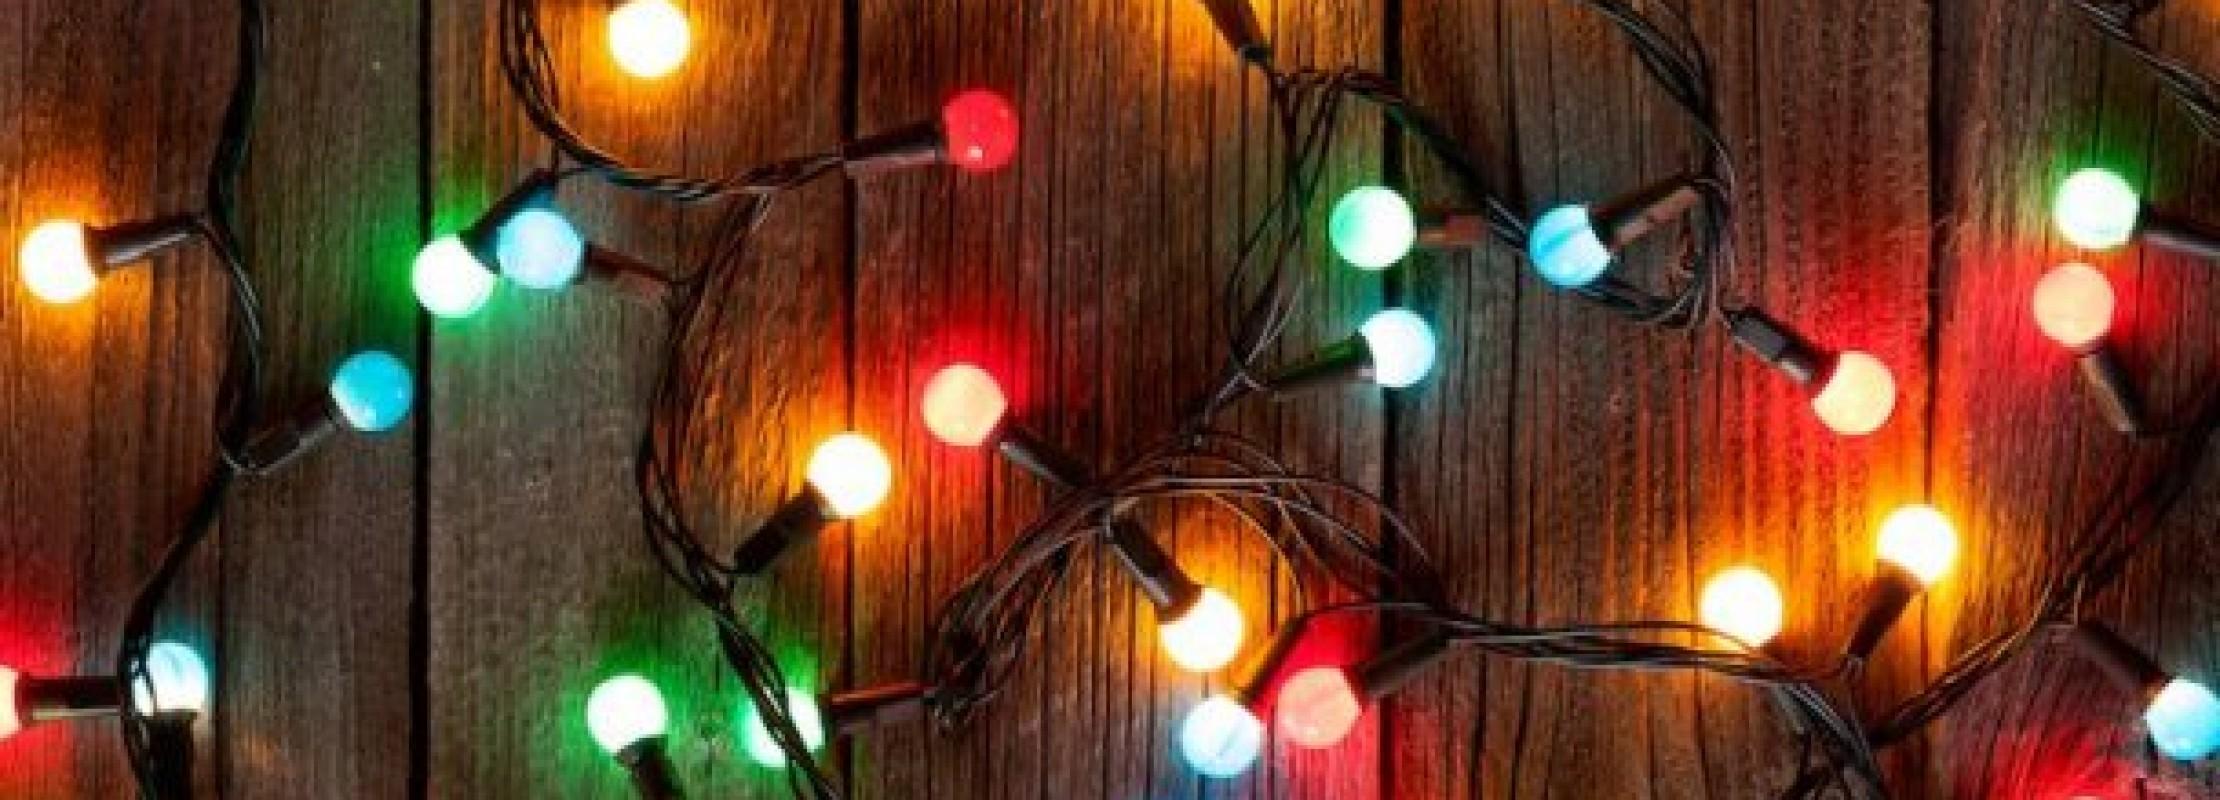 Addobbi natalizi nordici on line menu di natale for Obi addobbi natalizi